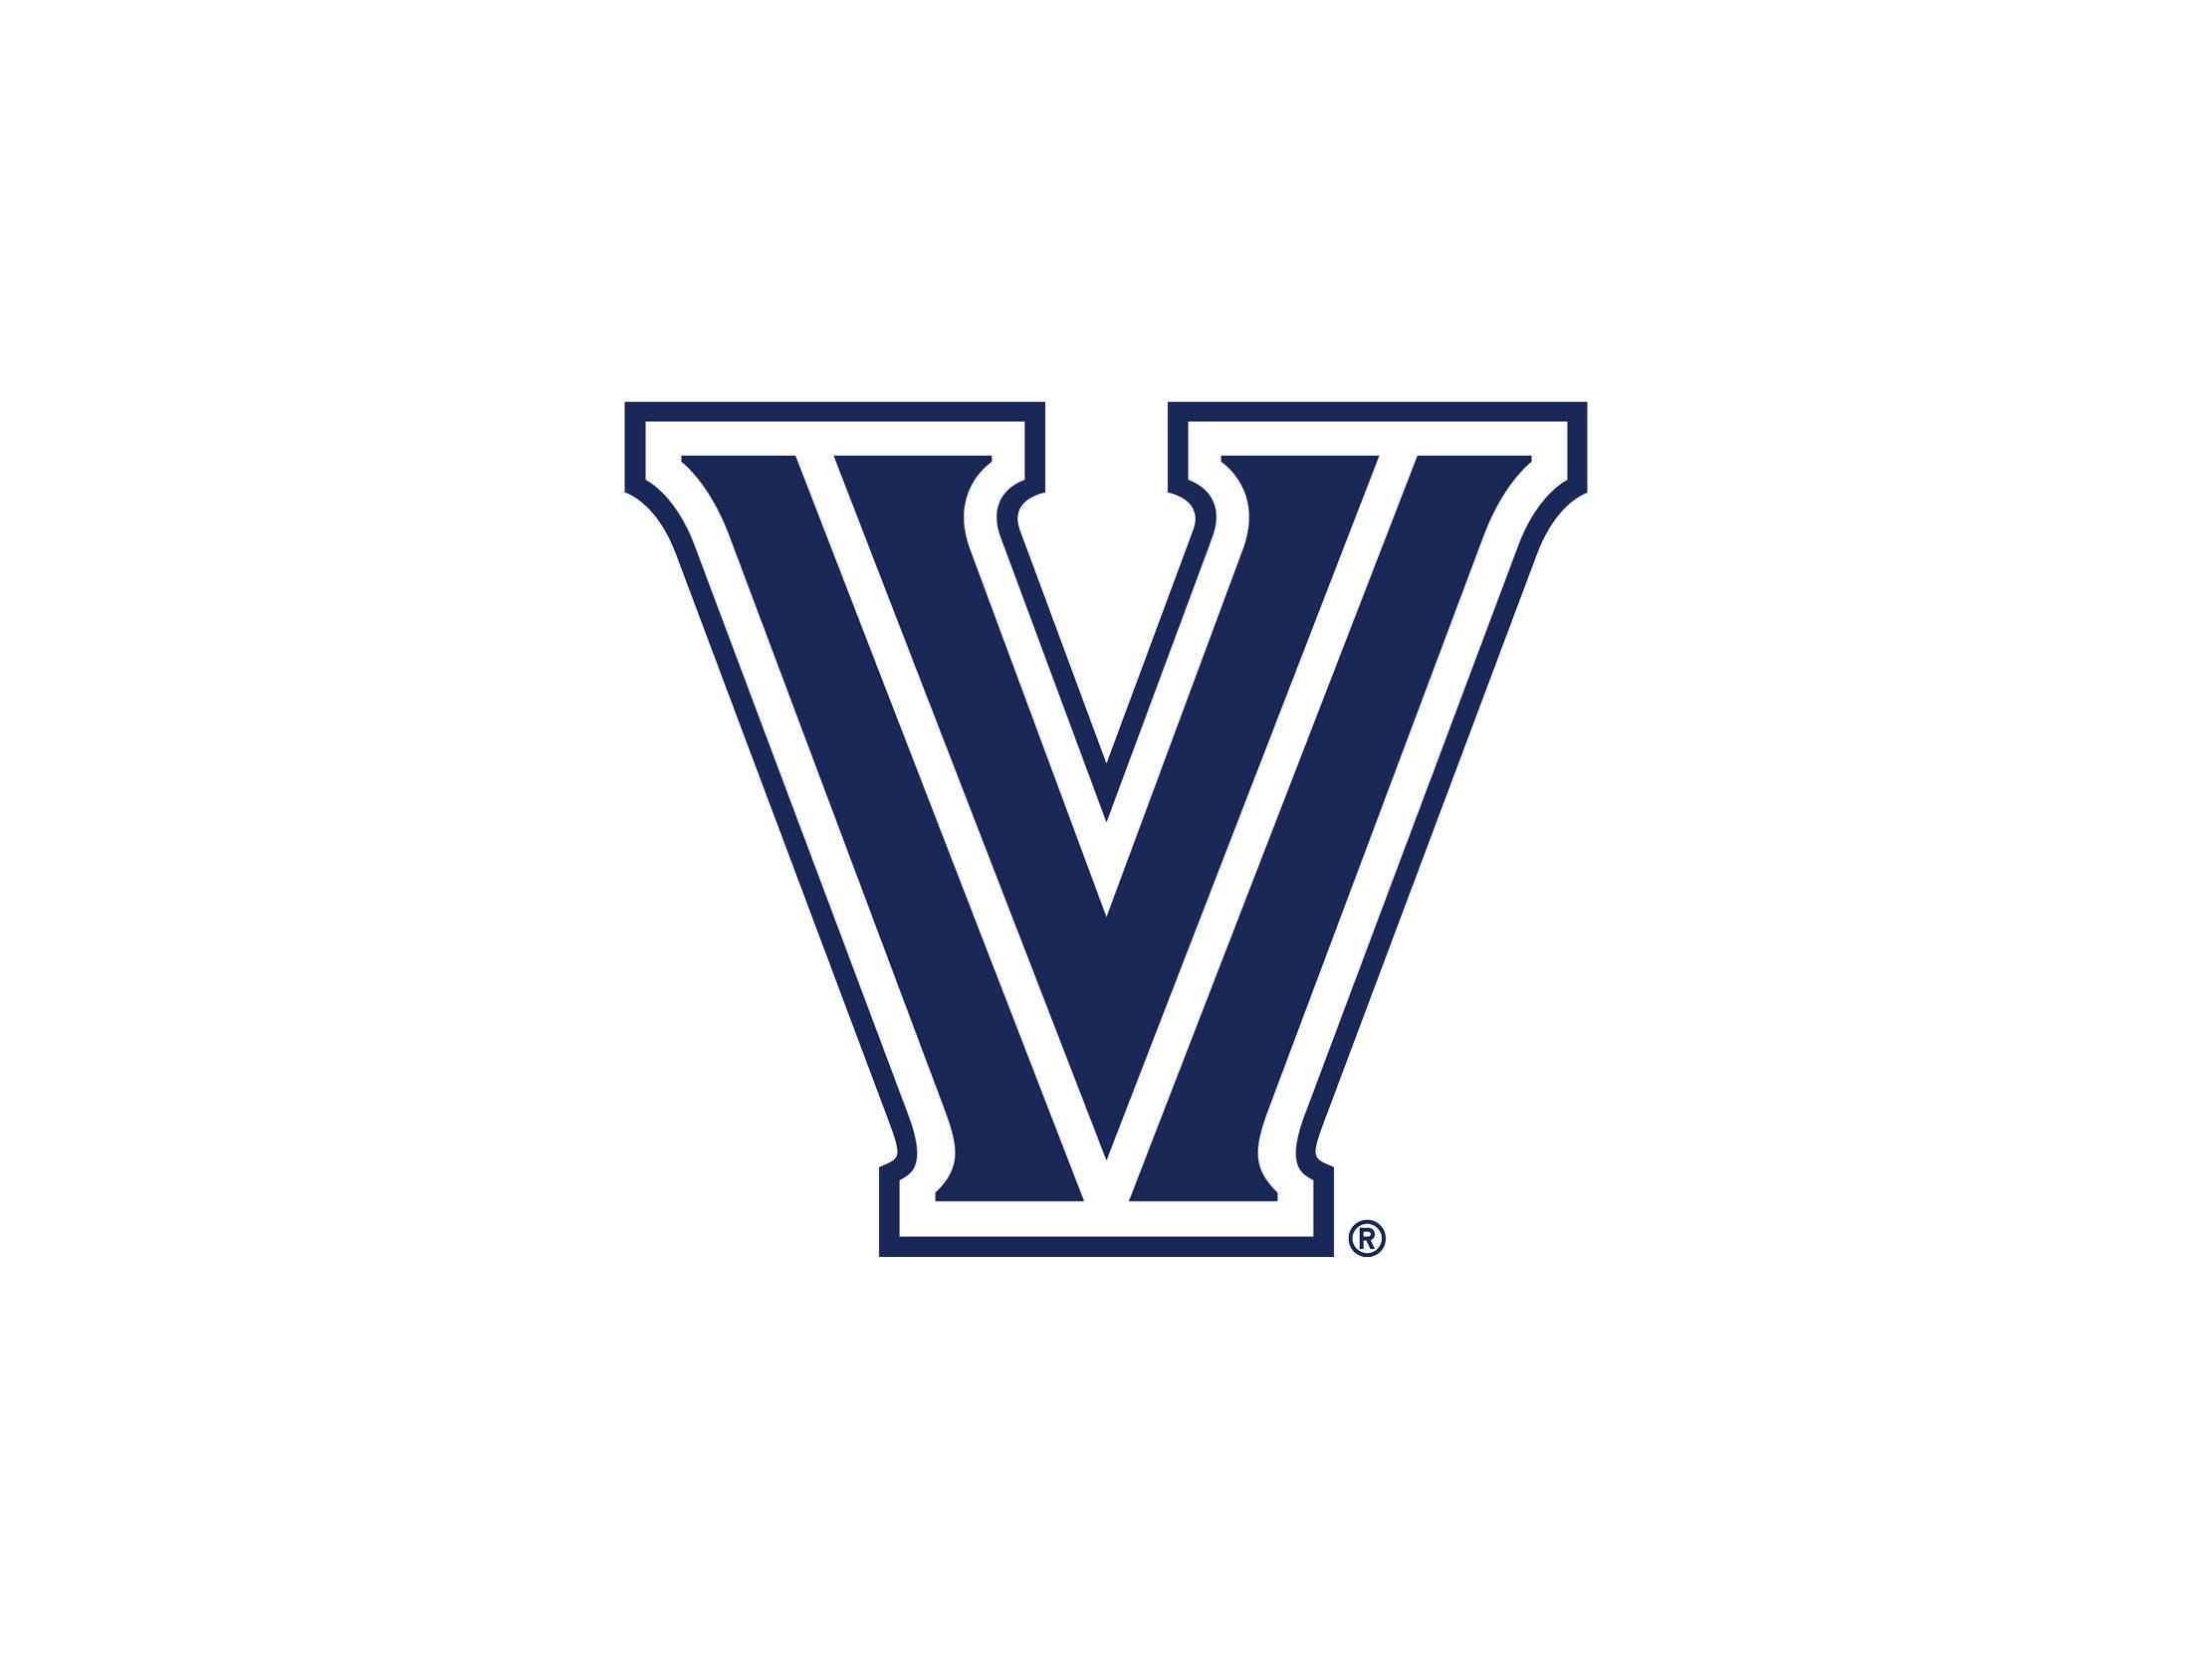 Villanova logo clipart clipart freeuse library University-level Logo Guide | Villanova University clipart freeuse library